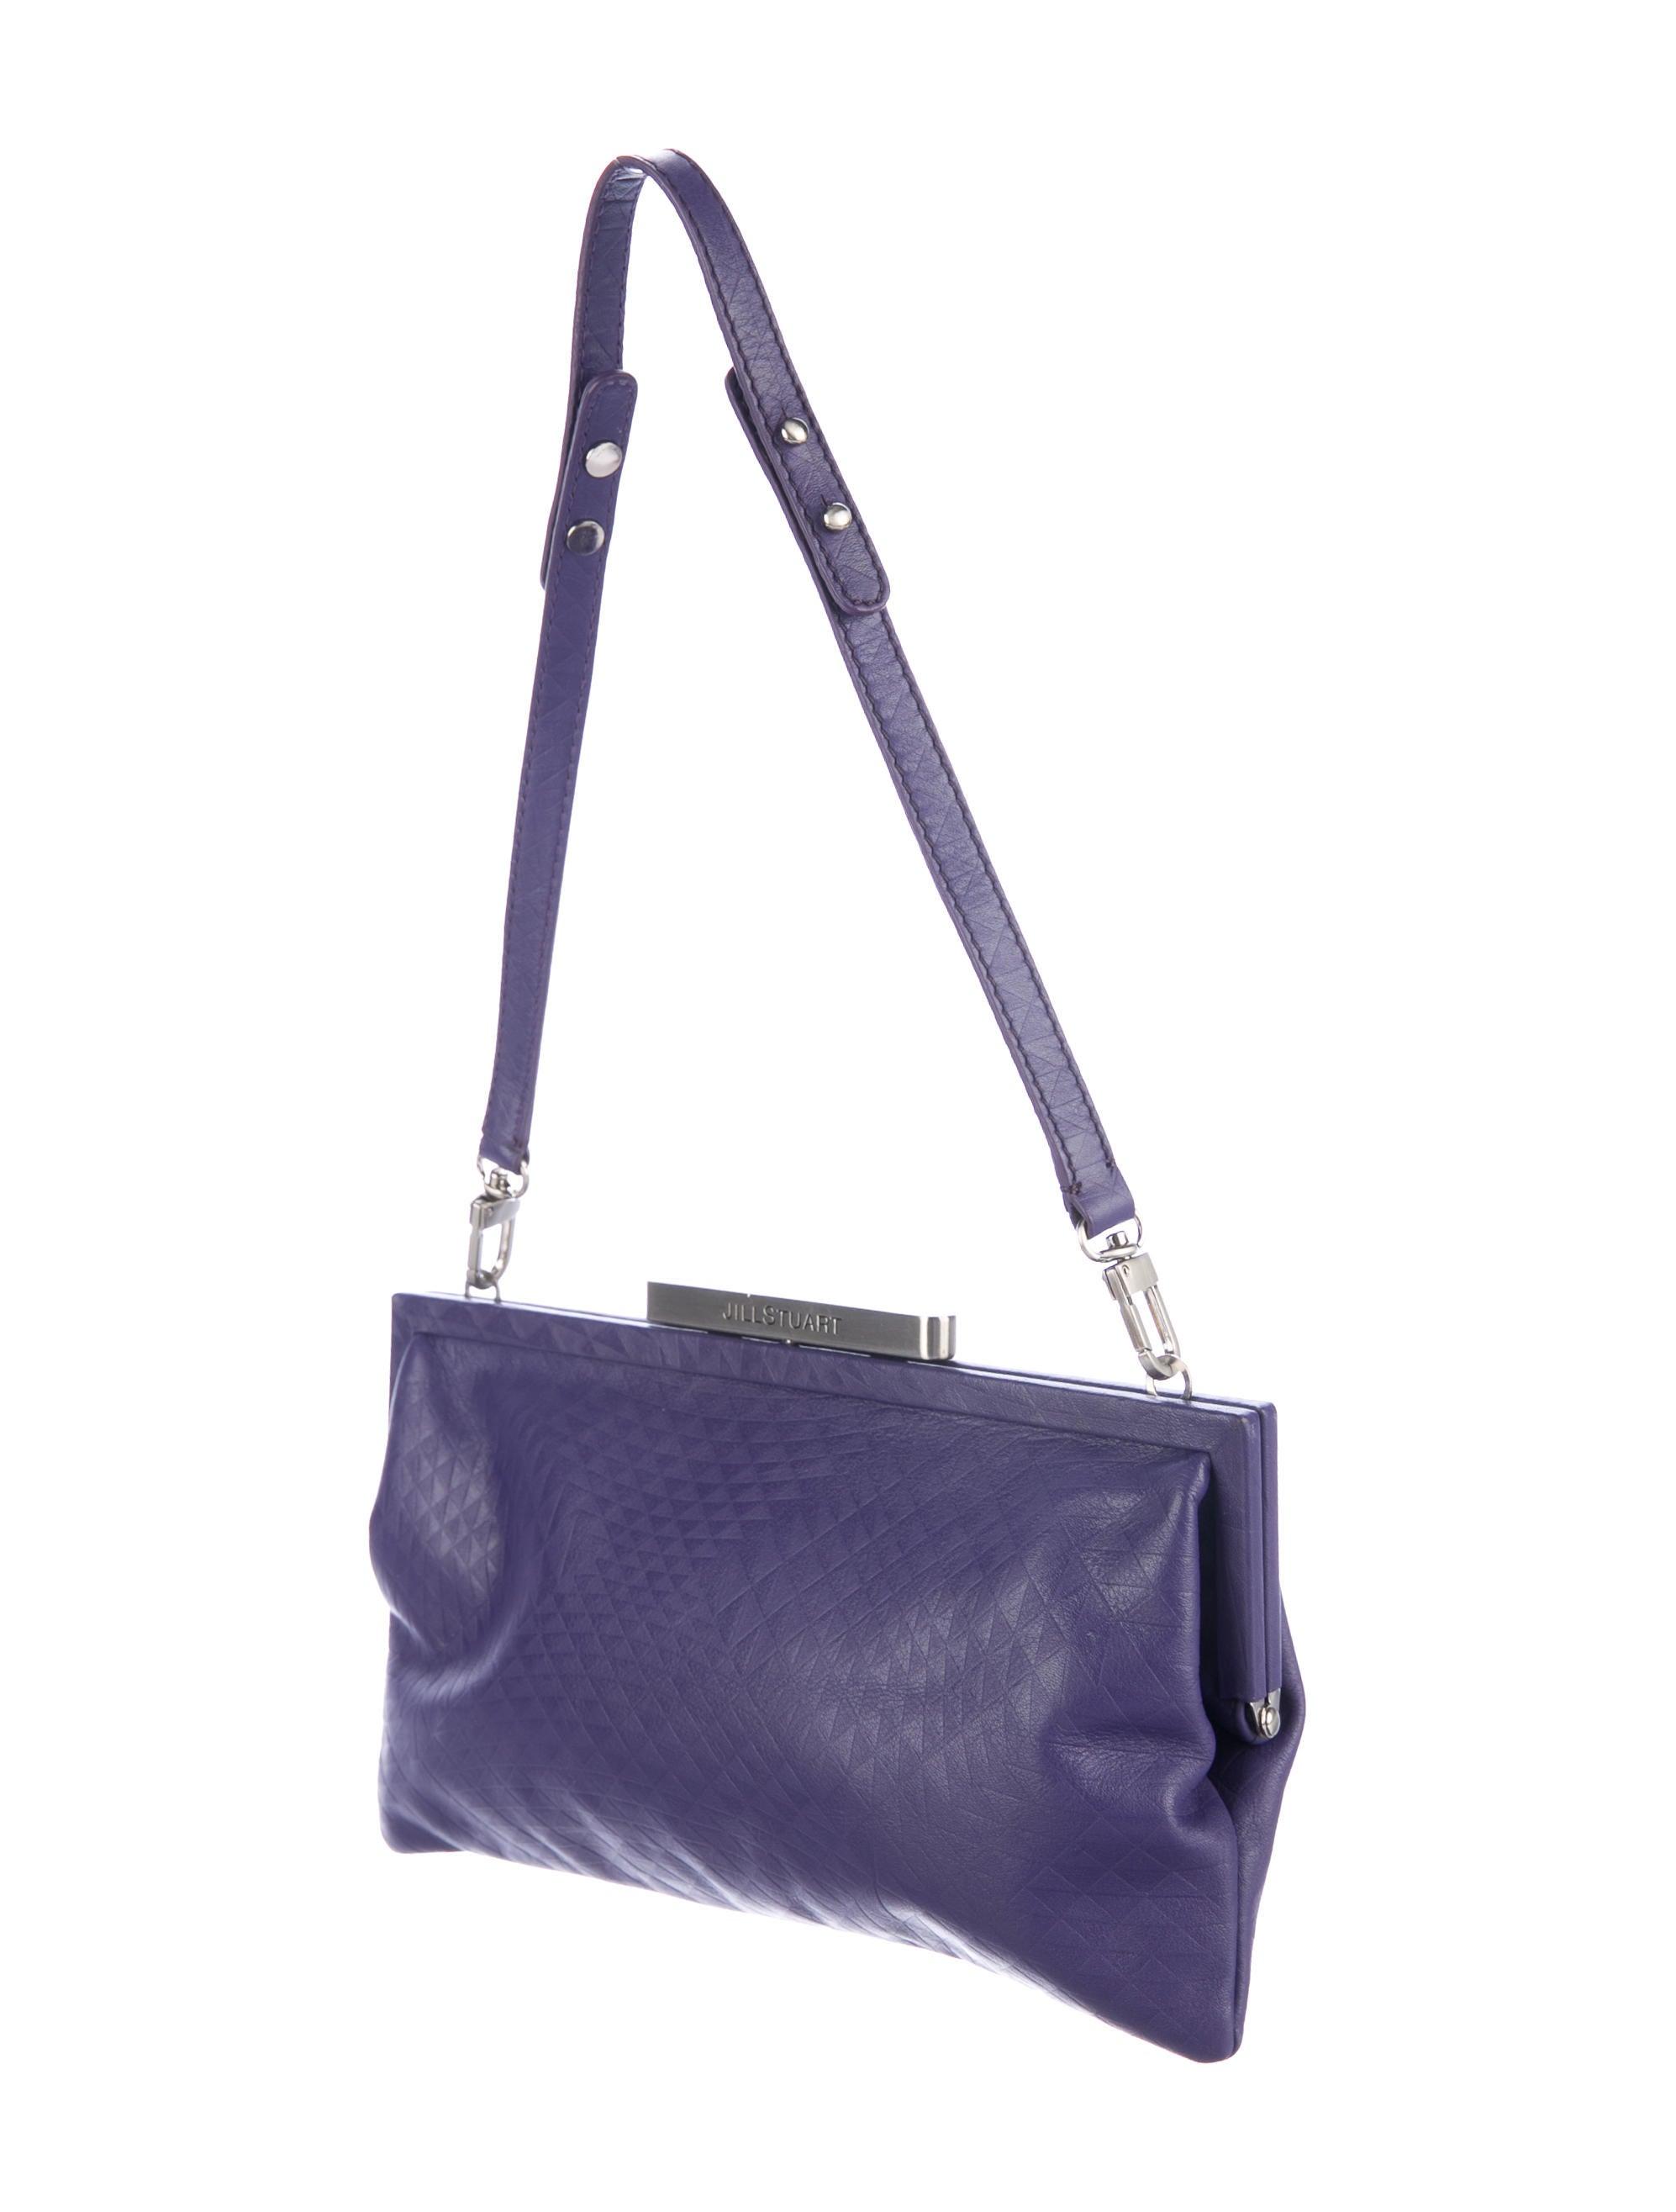 70210d28f6d0 Jill stuart embossed leather frame bag handbags jis jpg 1994x2631 Jill  stuart bag